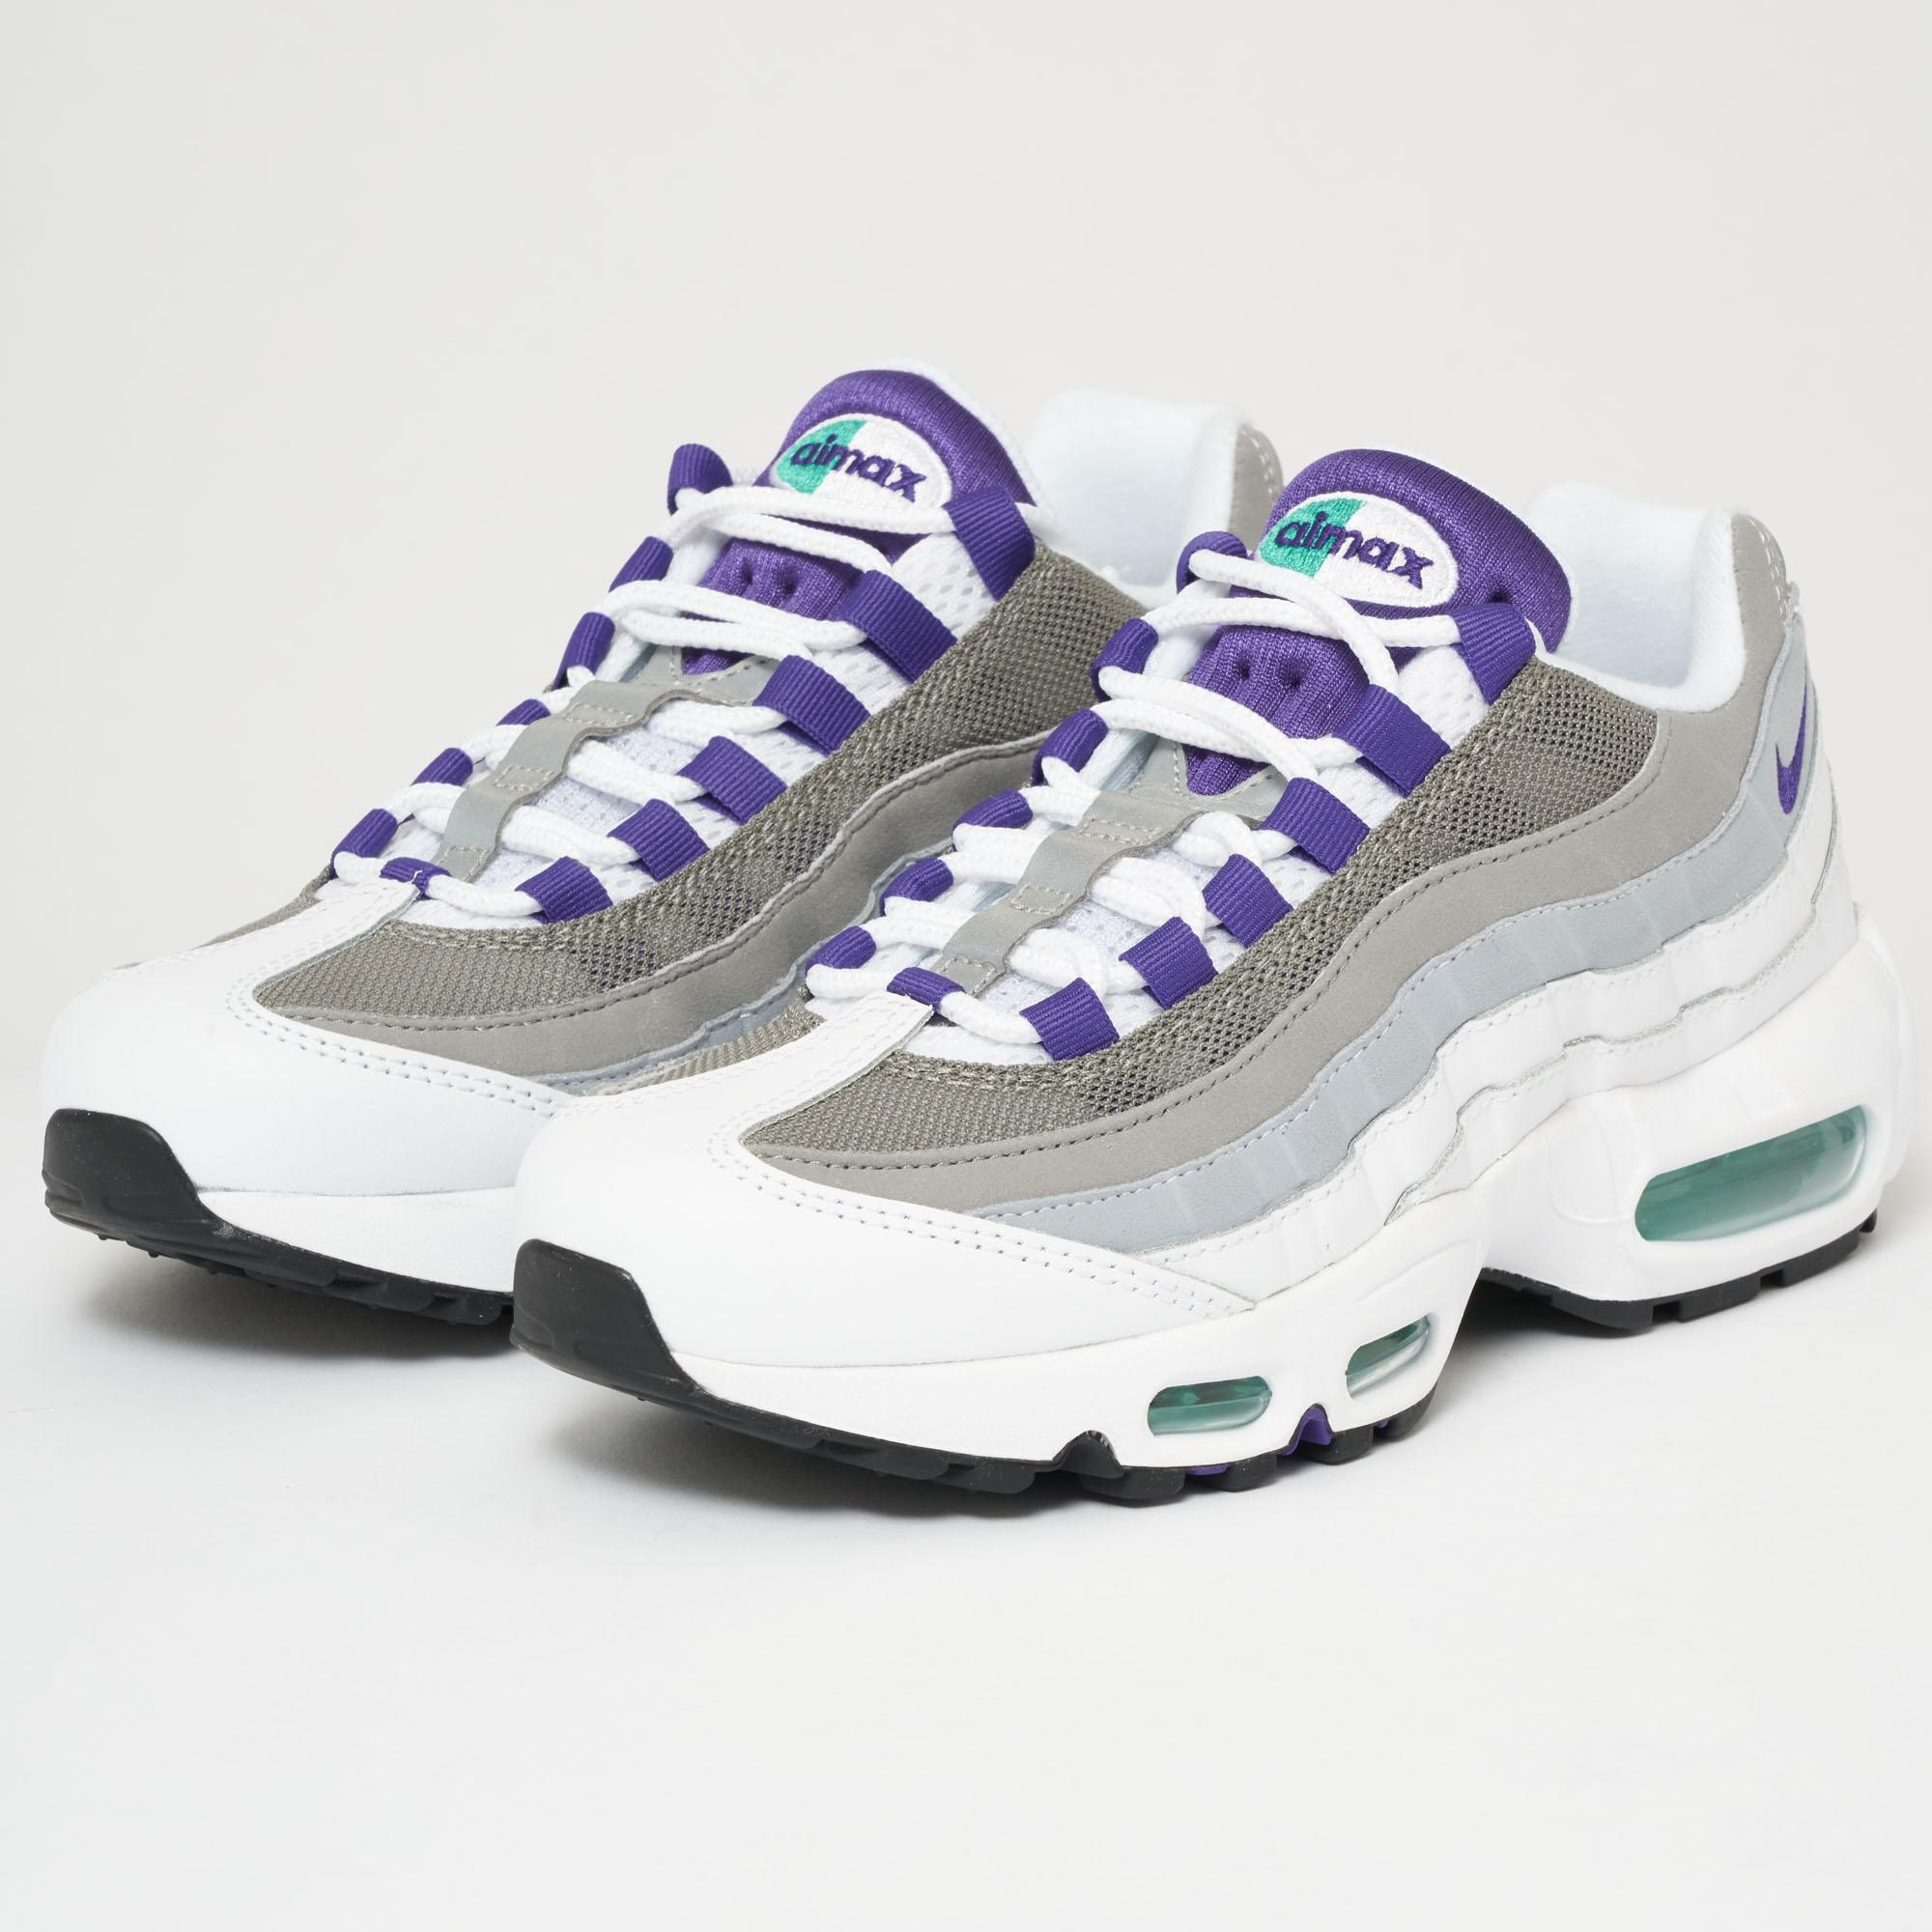 factory price 5520c 8aeb7 Nike Air Max 95 W - White & Purple